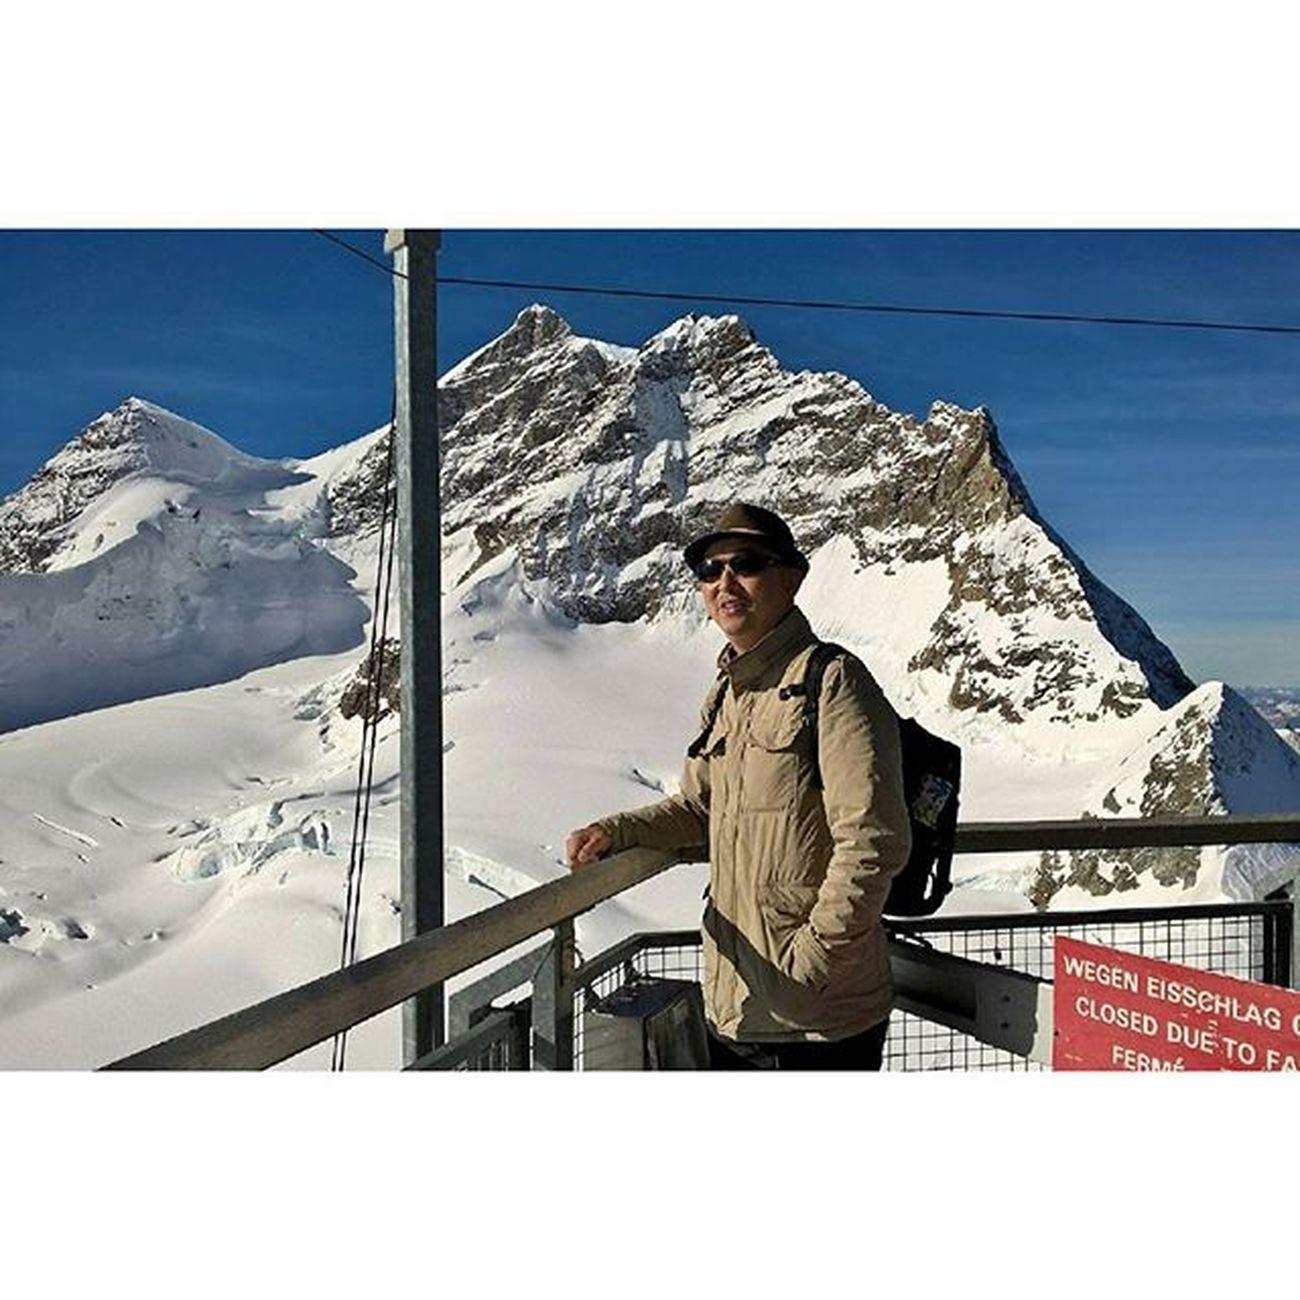 Jungfrau Jungfraujoch Swiss